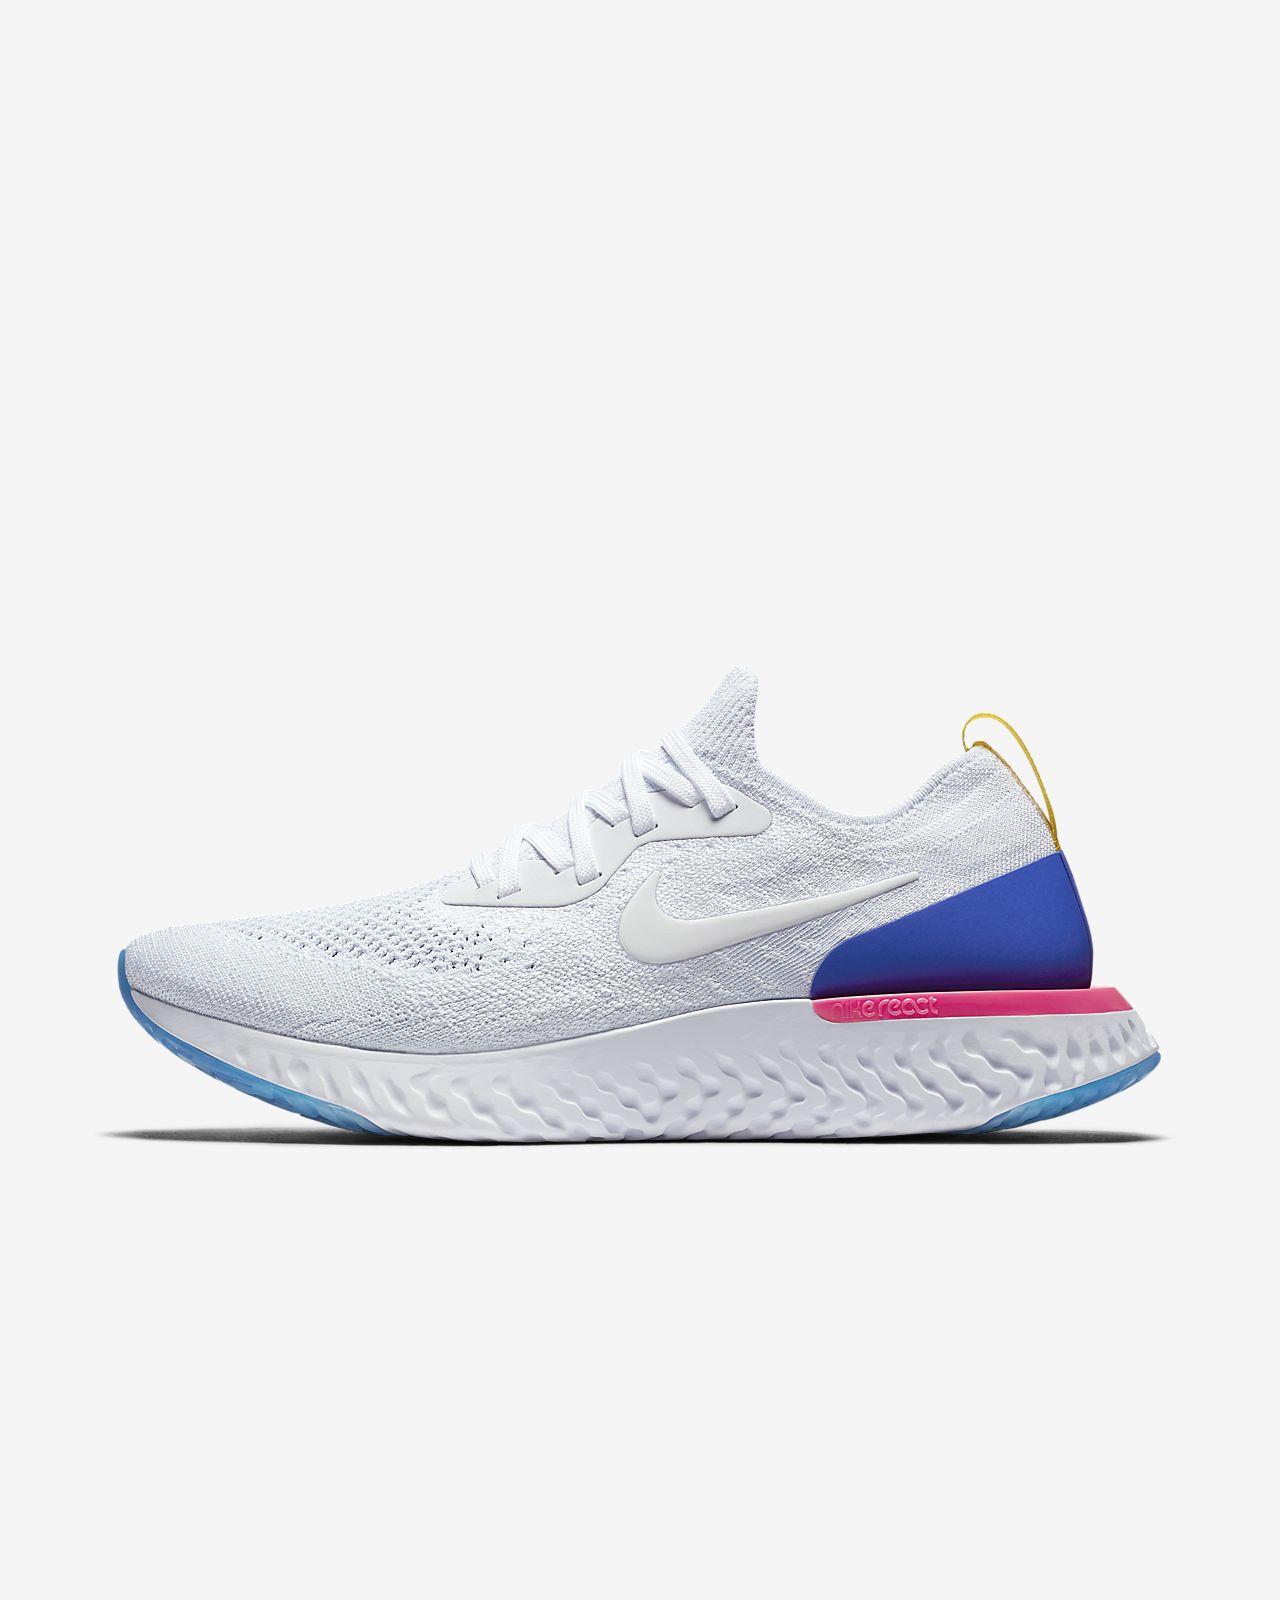 Nike Mens Flyknit Air Max Running Shoes